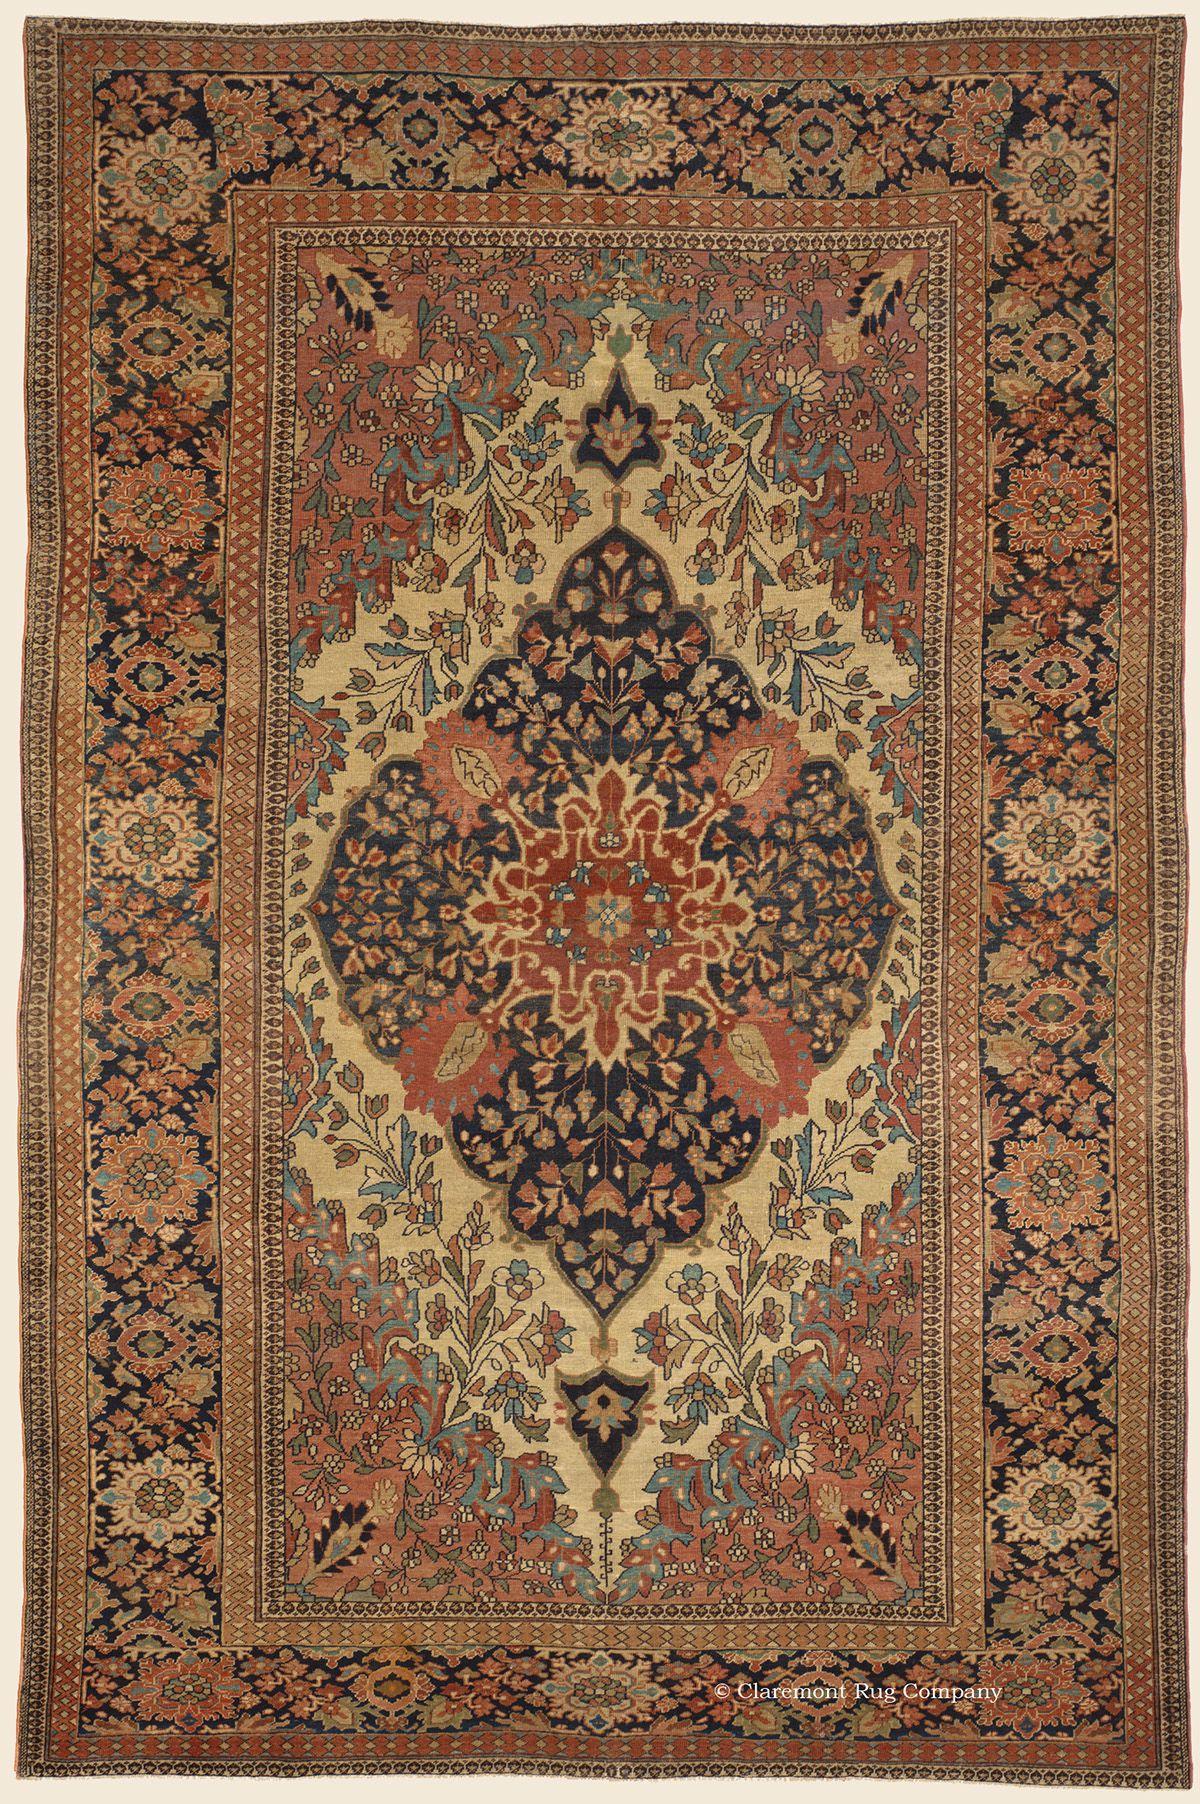 Ferahan Sarouk 6 8 X 10 1 3rd Quarter 19th Century West Central Persian Antique Rug Clarem Persian Rug Designs Antique Persian Carpet Persian Carpet